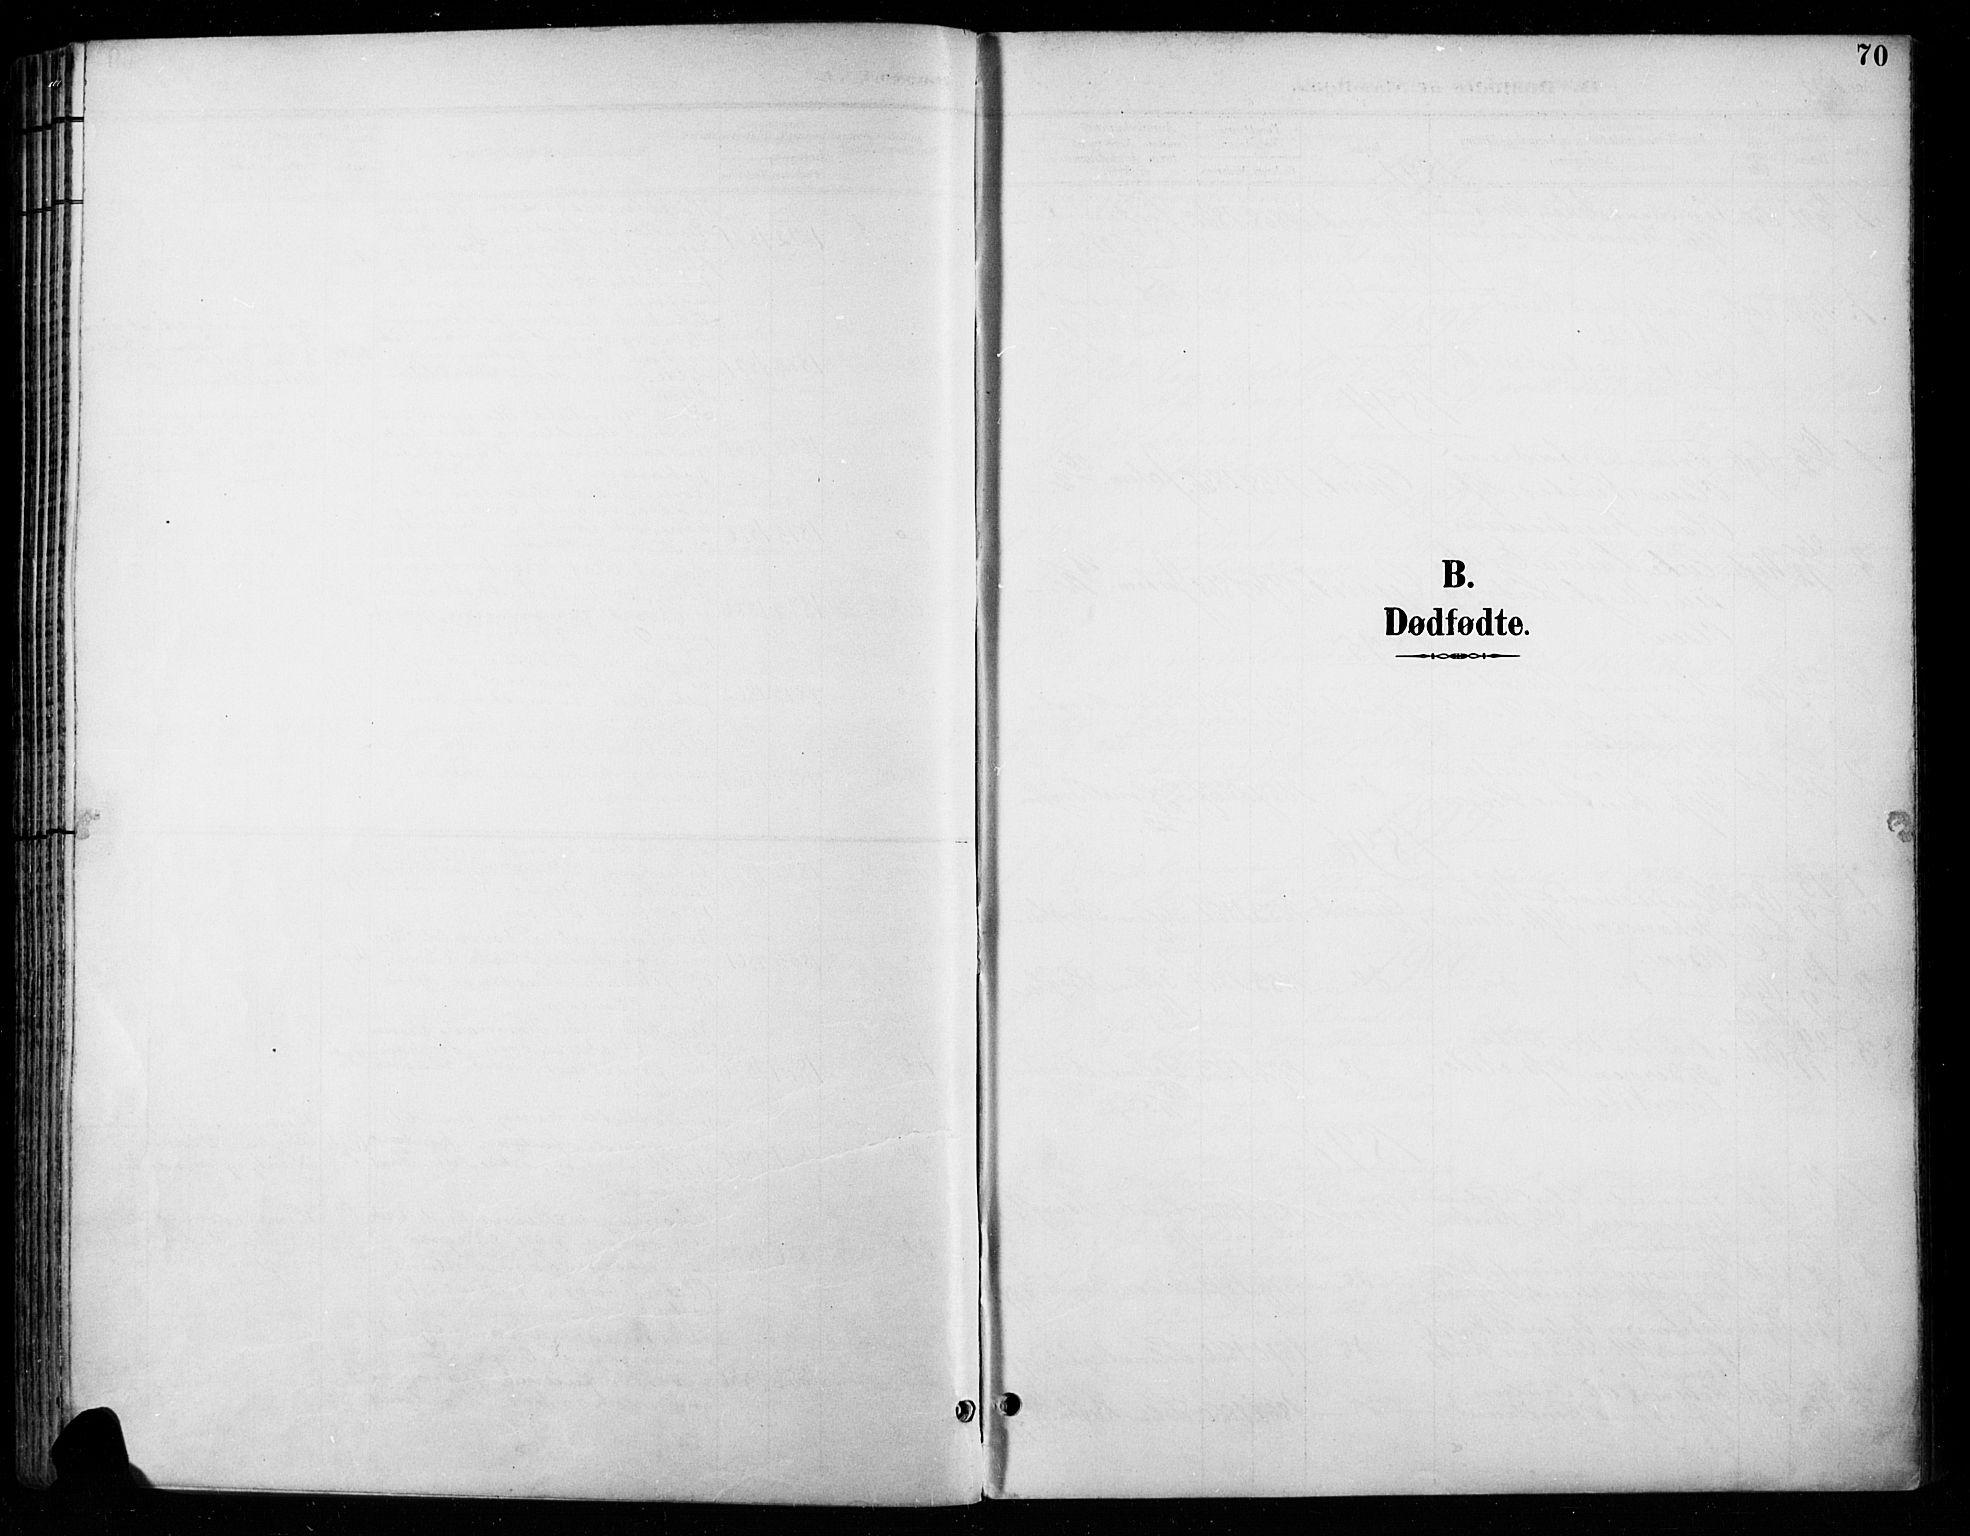 SAH, Vardal prestekontor, H/Ha/Haa/L0011: Ministerialbok nr. 11, 1891-1901, s. 70